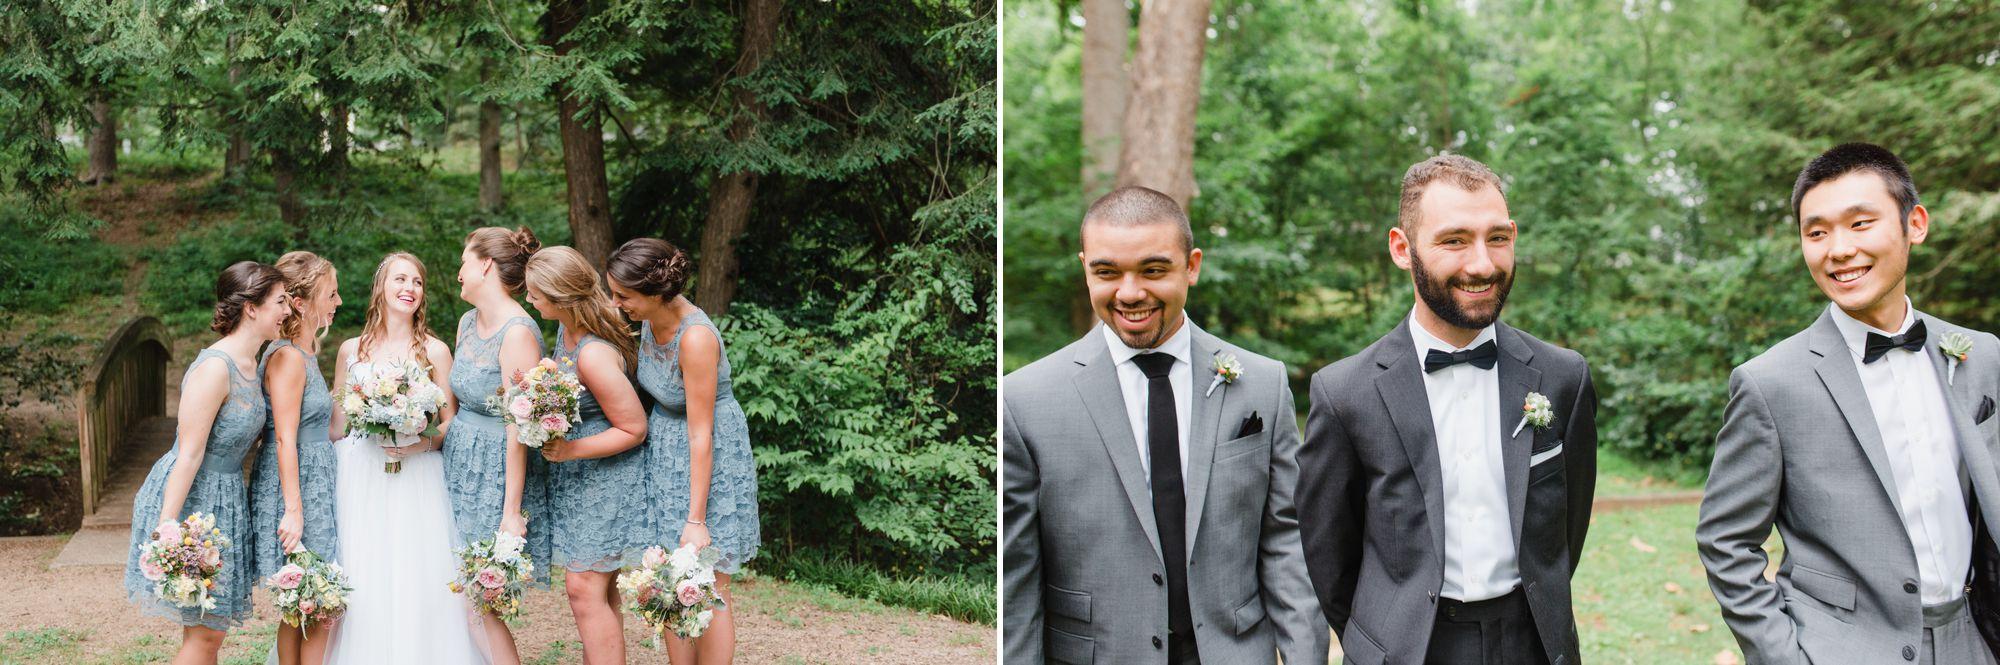 uptown-charlotte-orthodox-greek-wedding 77